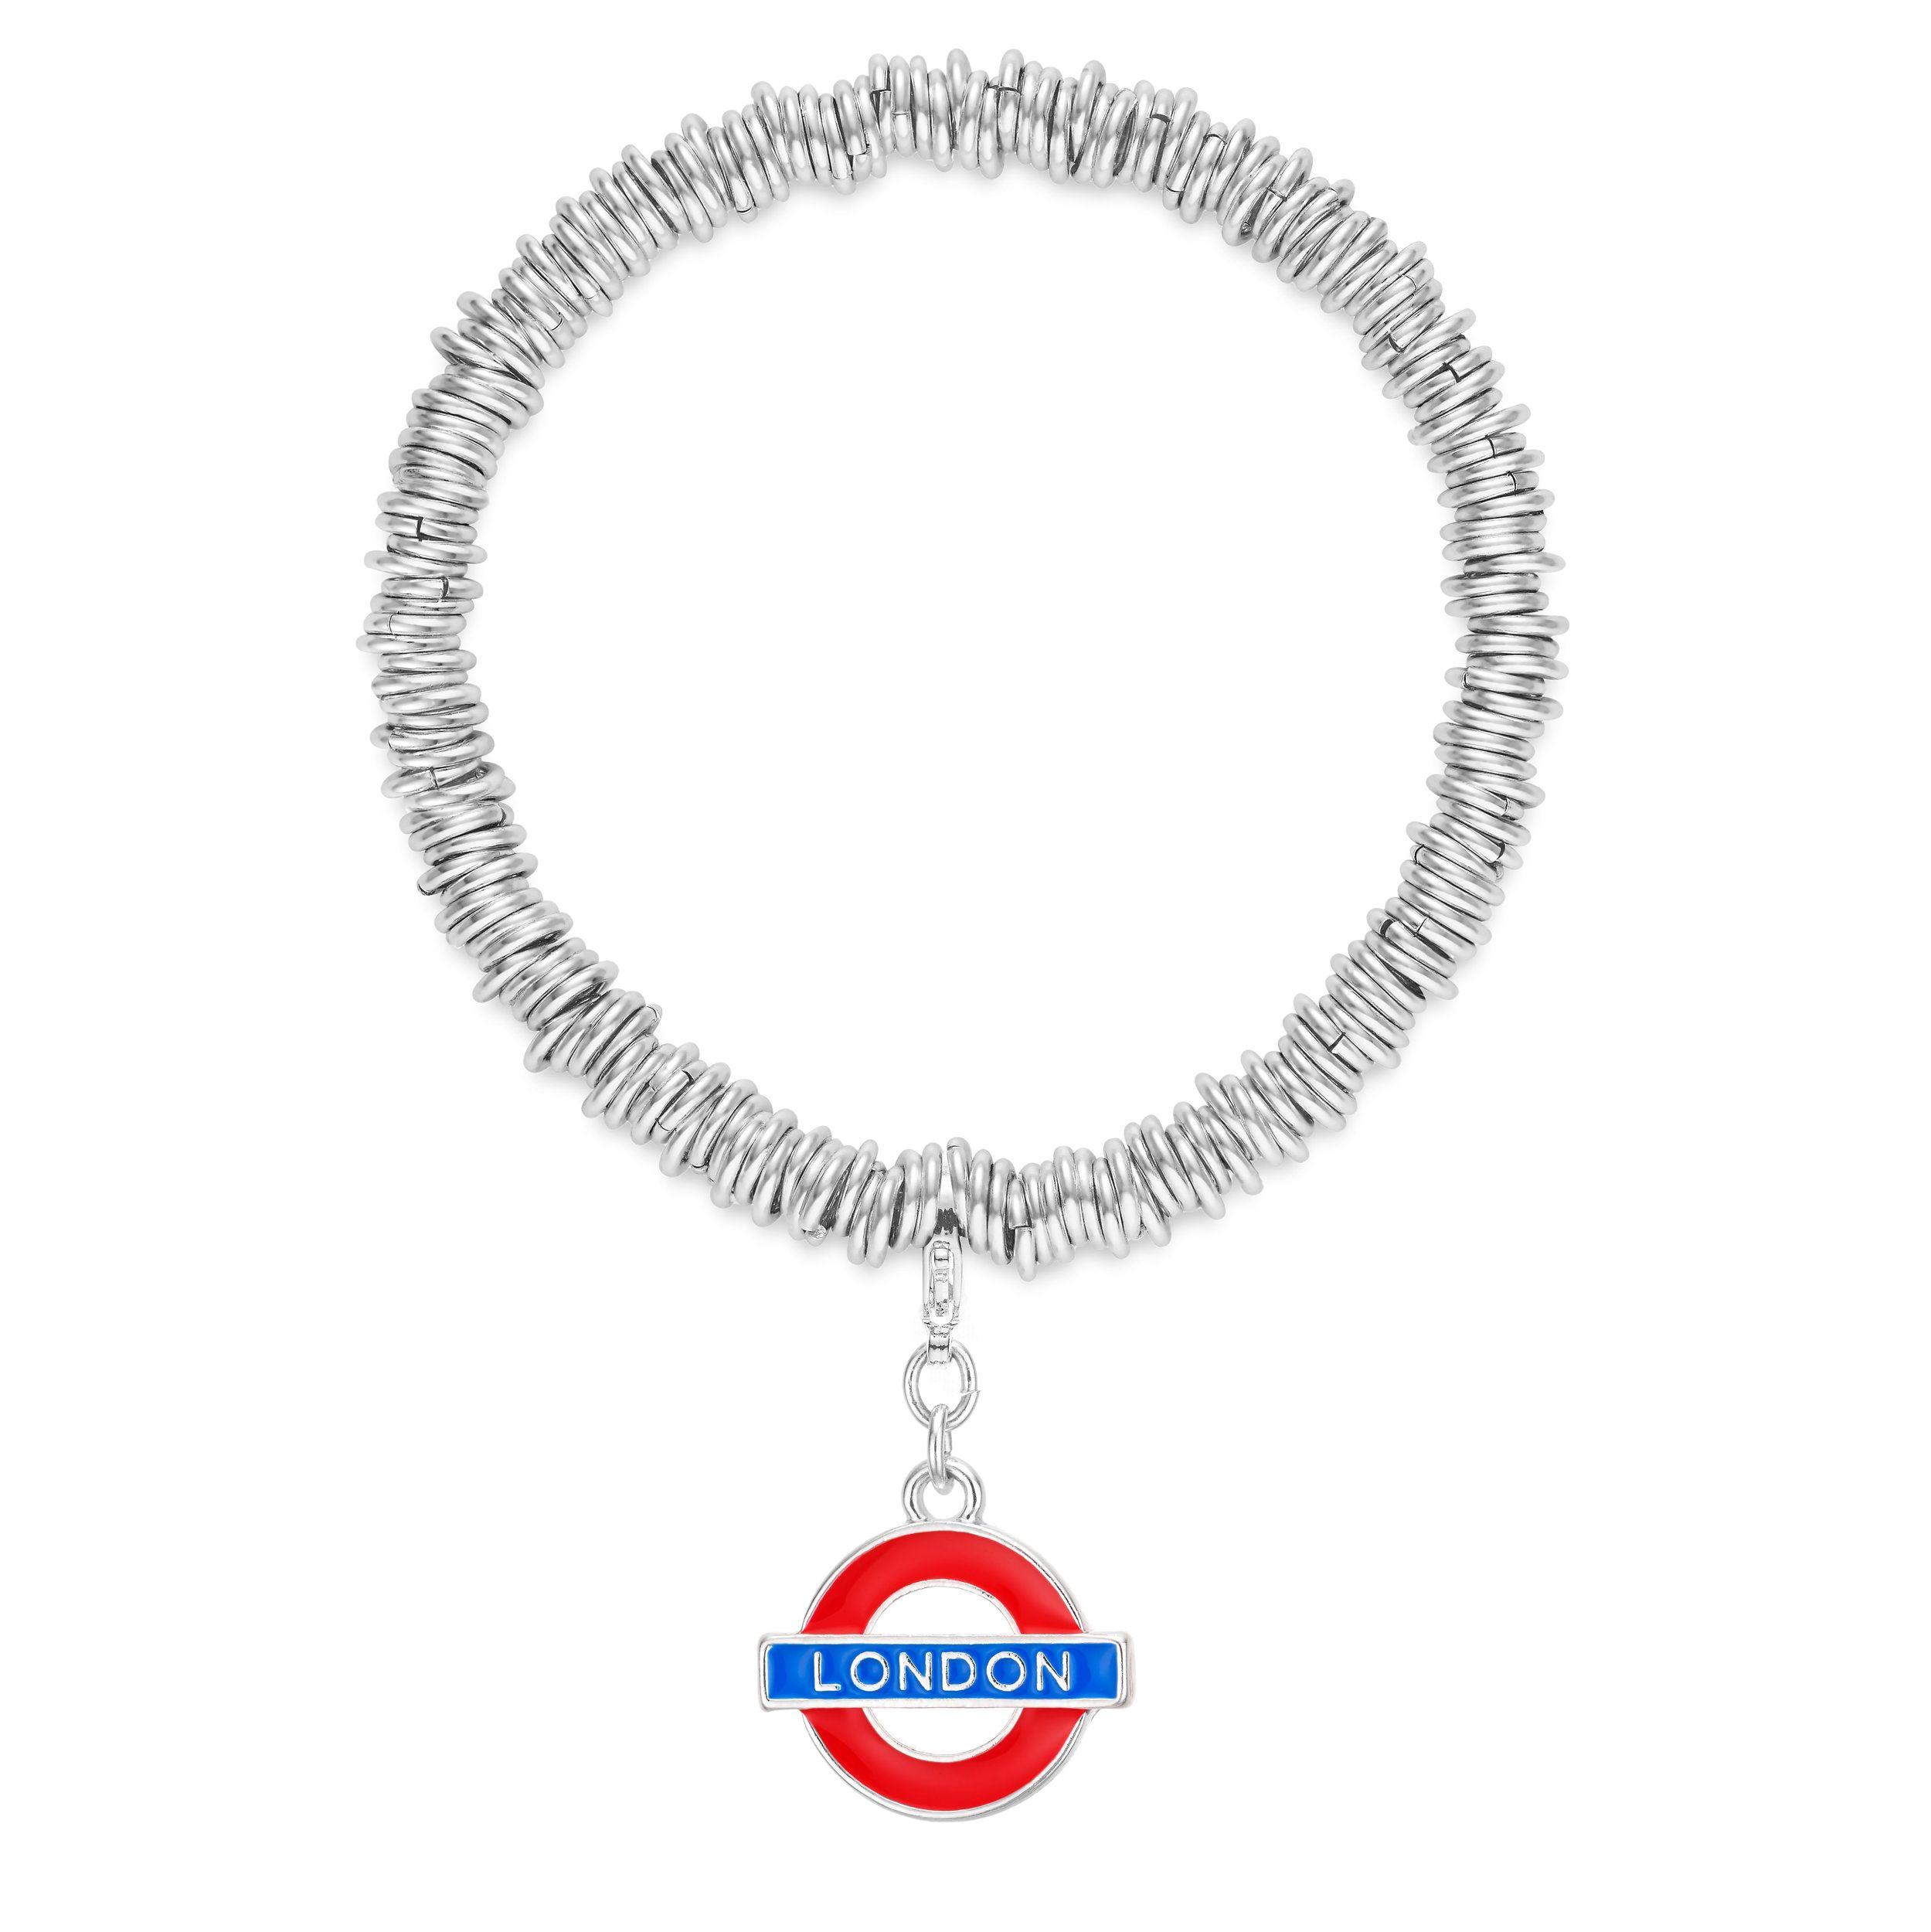 Buckley London Underground Charm Bracelet